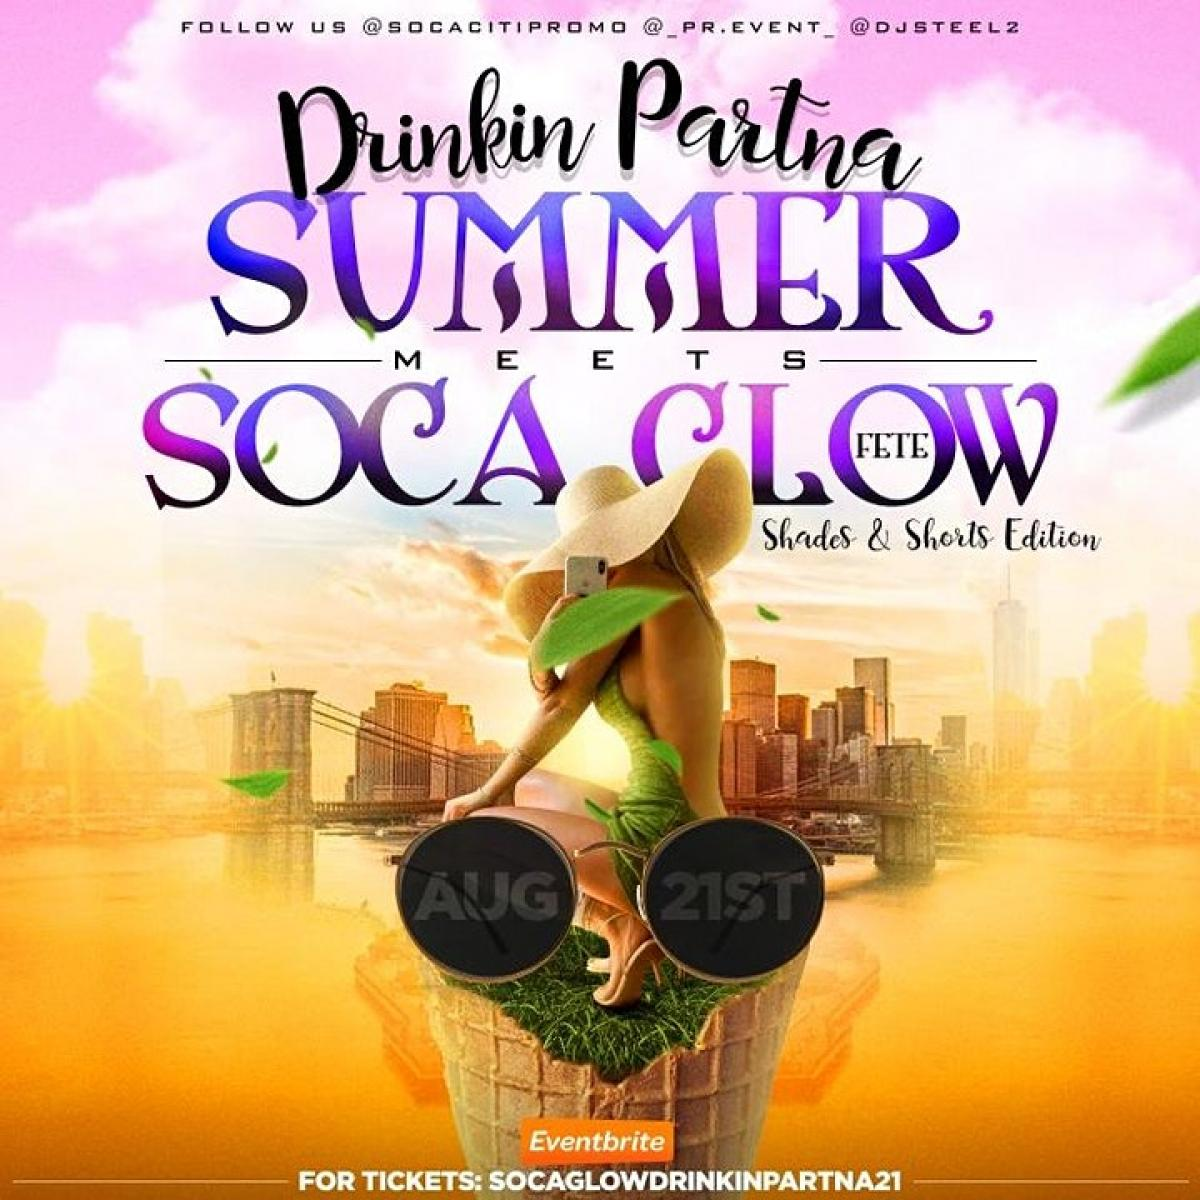 Soca Glow Meet Drinkin Partna Shades & Shorts flyer or graphic.